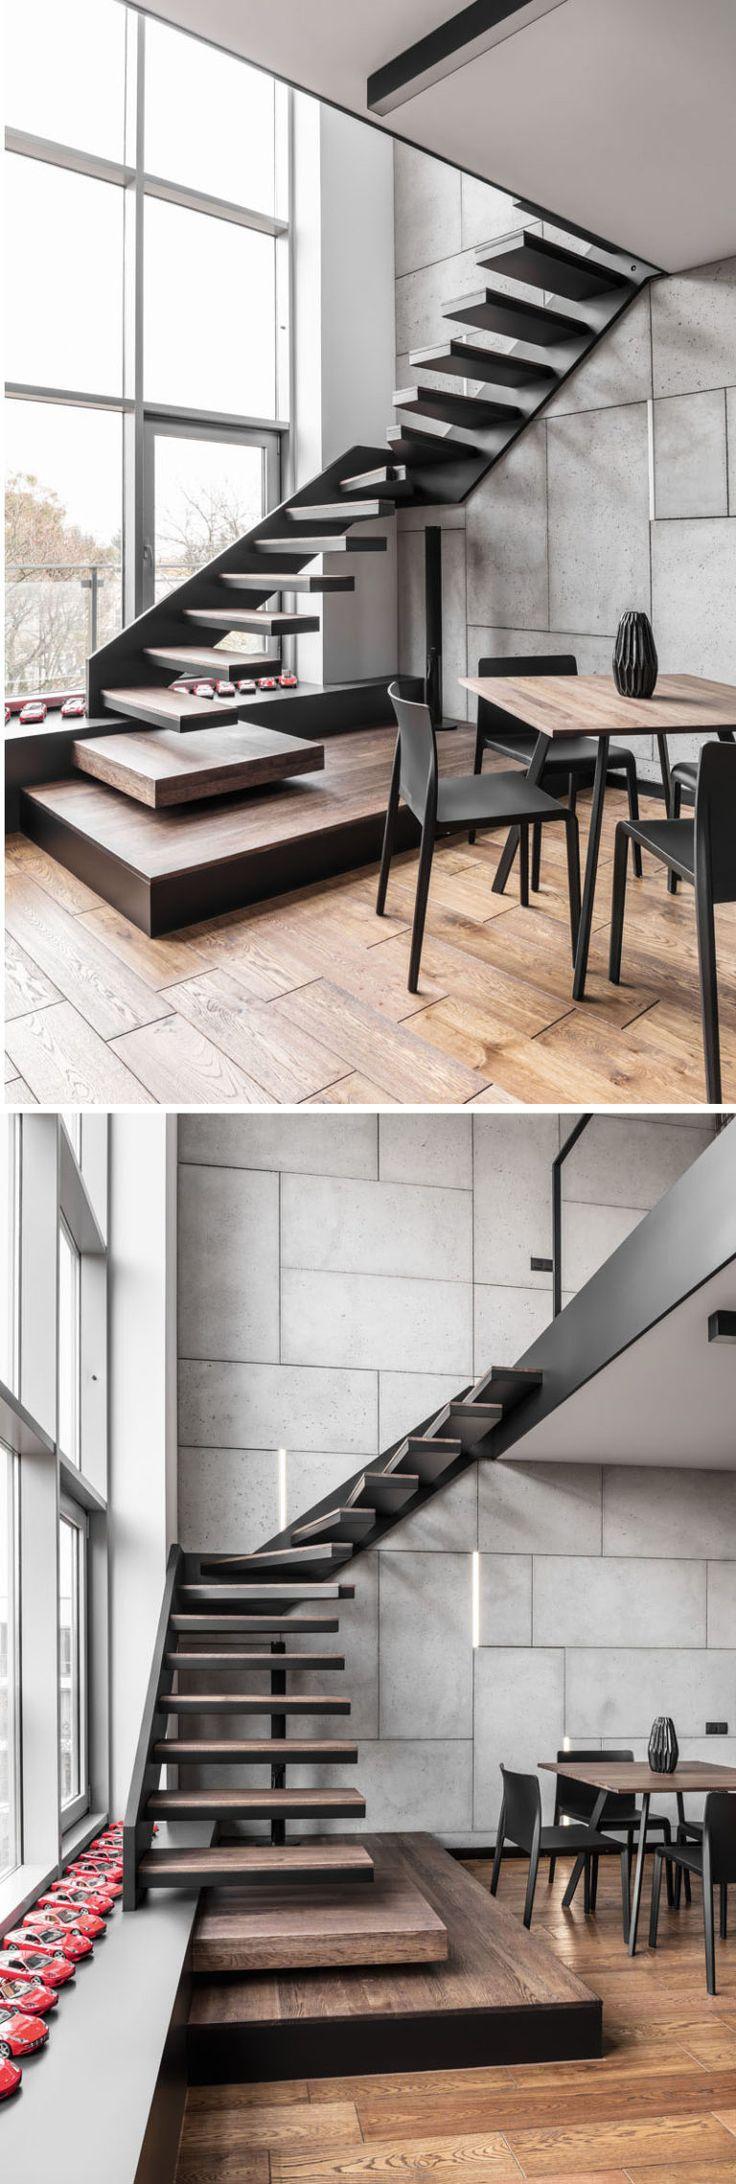 betontreppe selber bauen anleitung excellent treppe betonieren betontreppe selber bauen. Black Bedroom Furniture Sets. Home Design Ideas